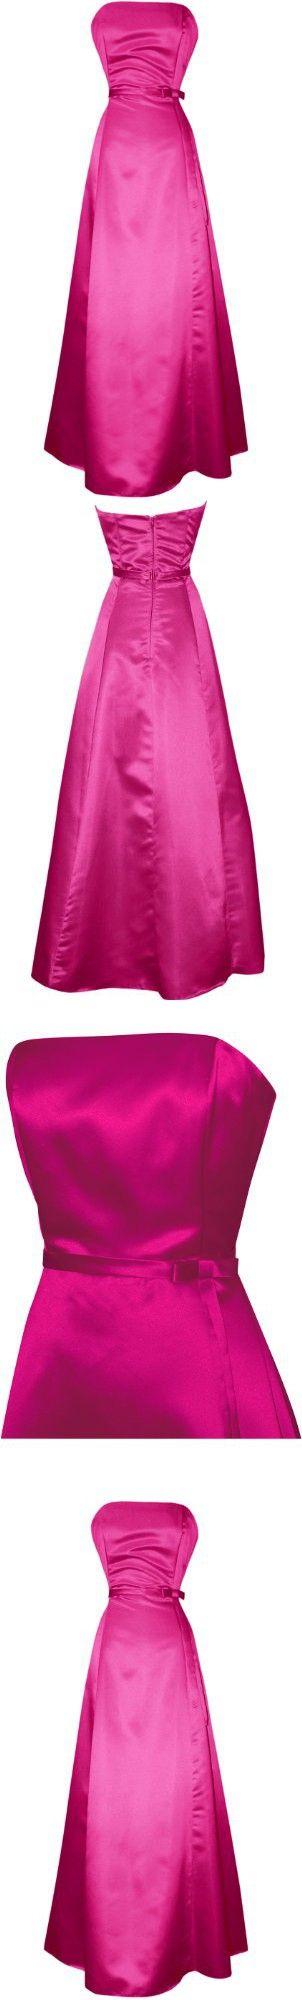 50s Strapless Satin Long Bridesmaid Prom Dress Formal Junior Plus Size, 2X, Fuchsia